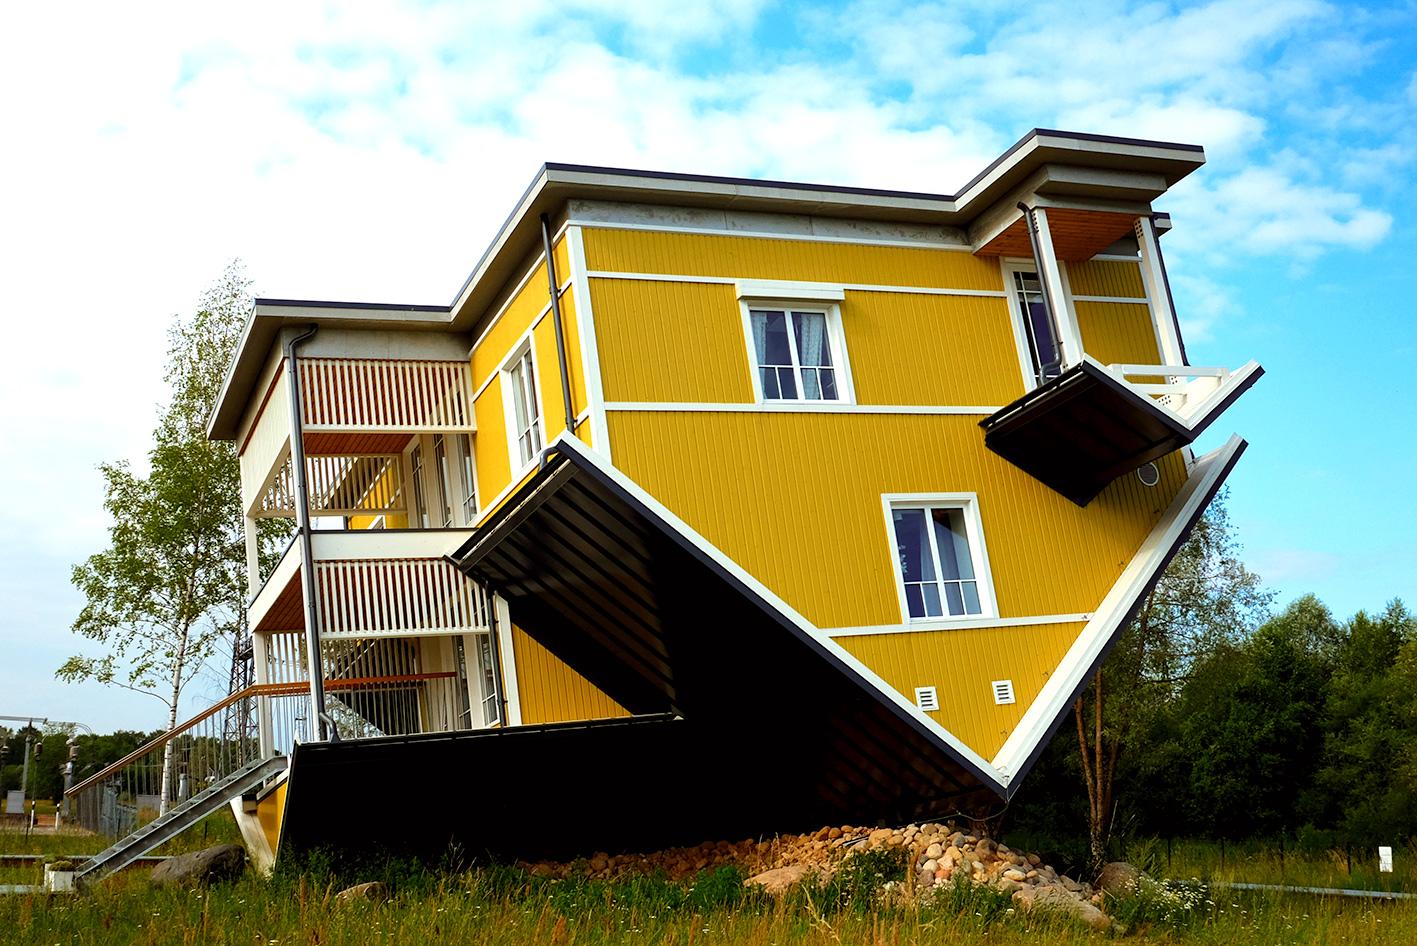 Upside down house Estonia